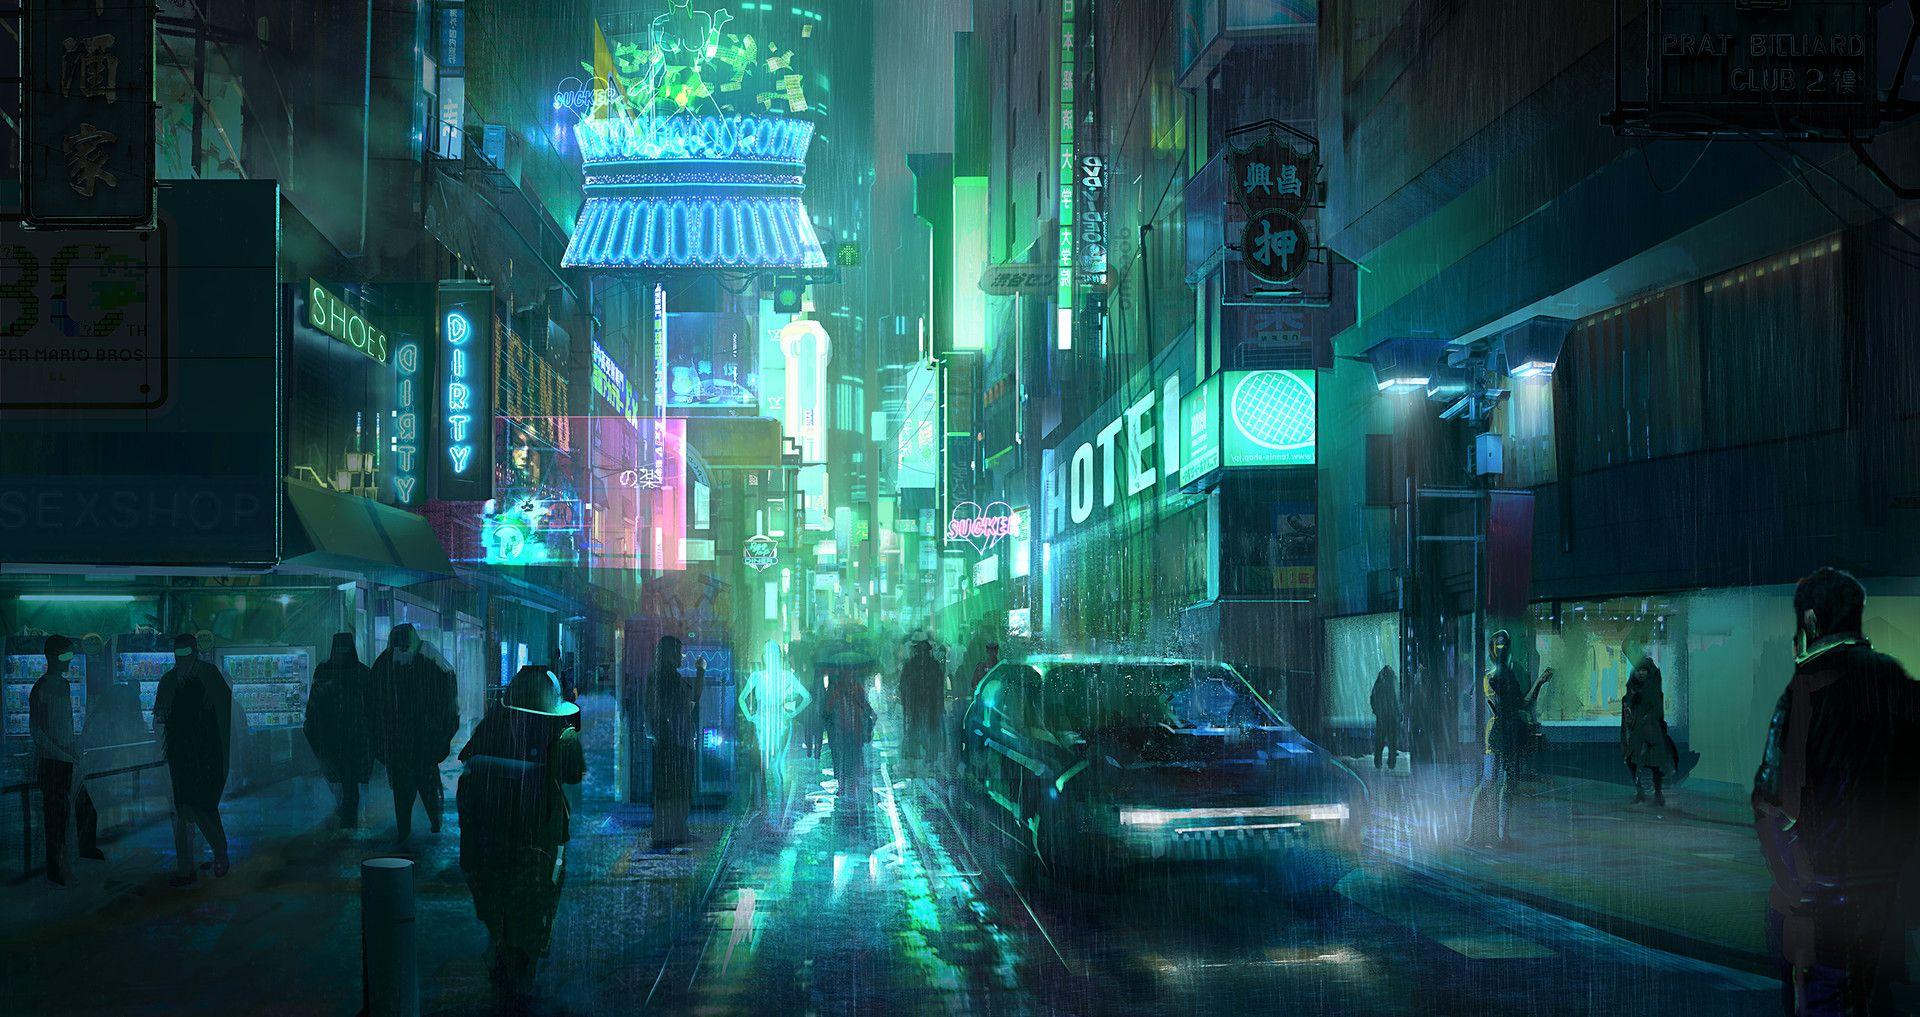 ArtStation Cyberpunk street, Liang Mark